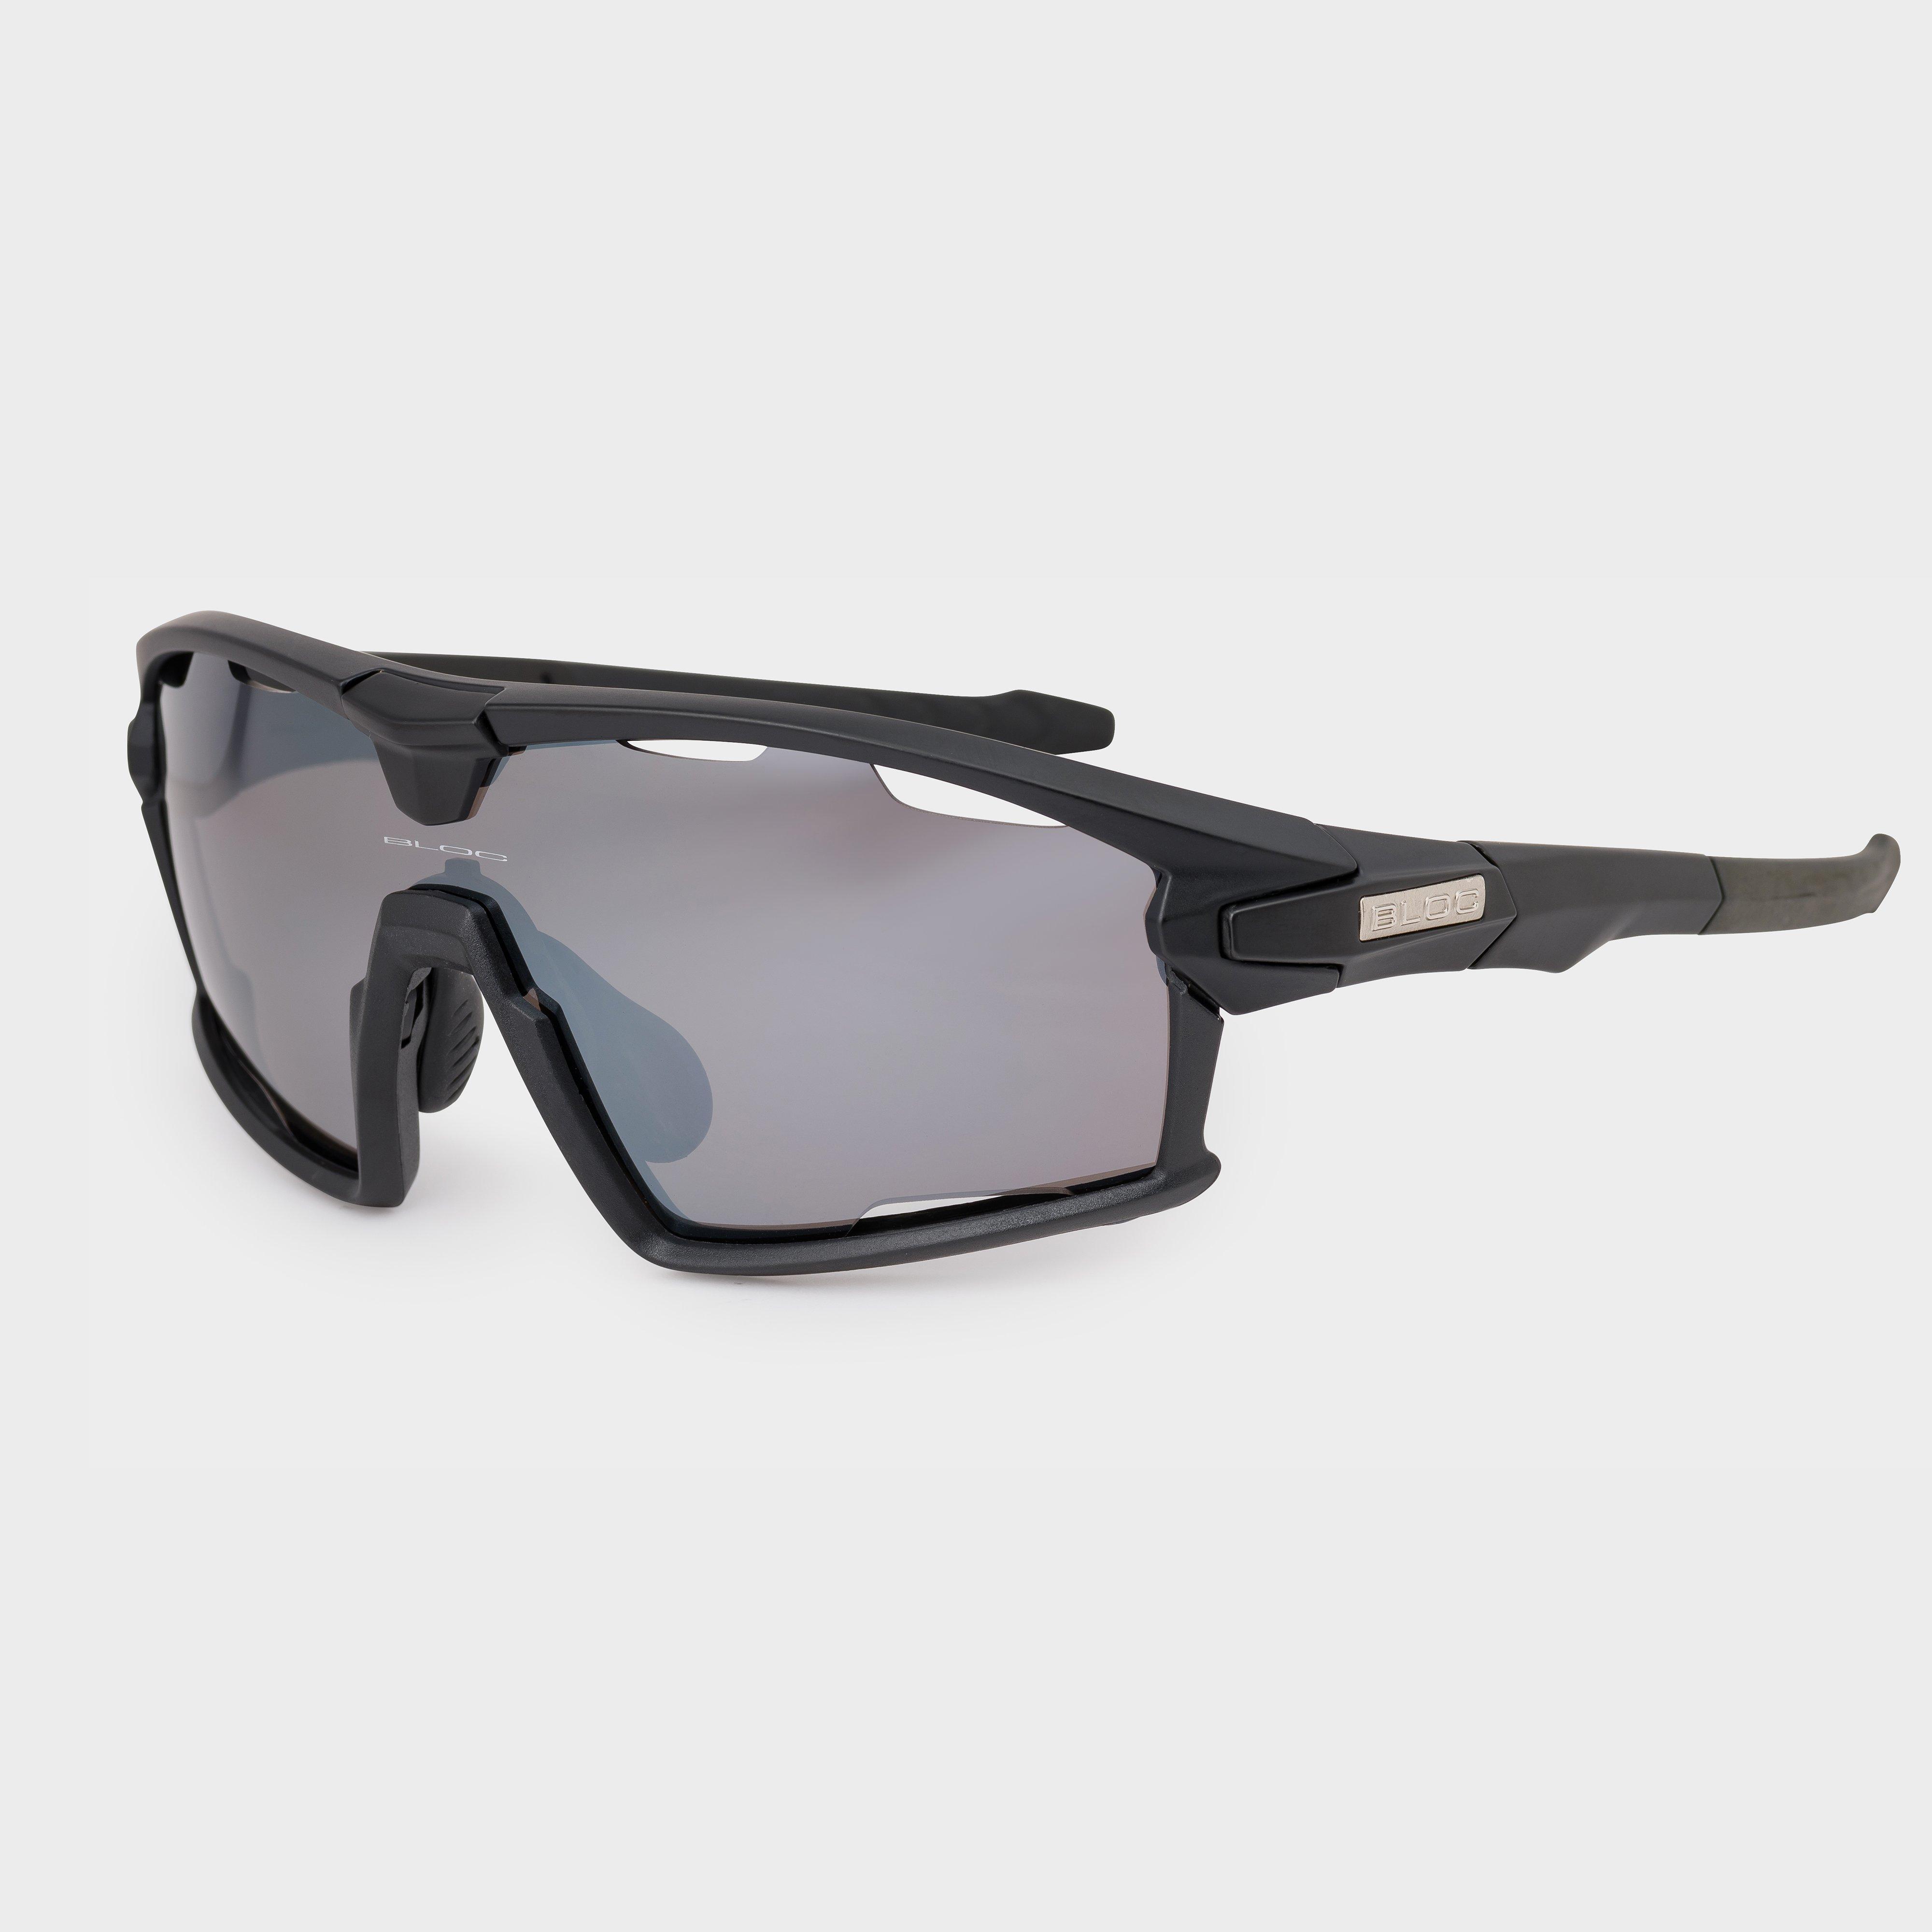 Bloc Forty X860 Sunglasses - Black/grey  Black/grey